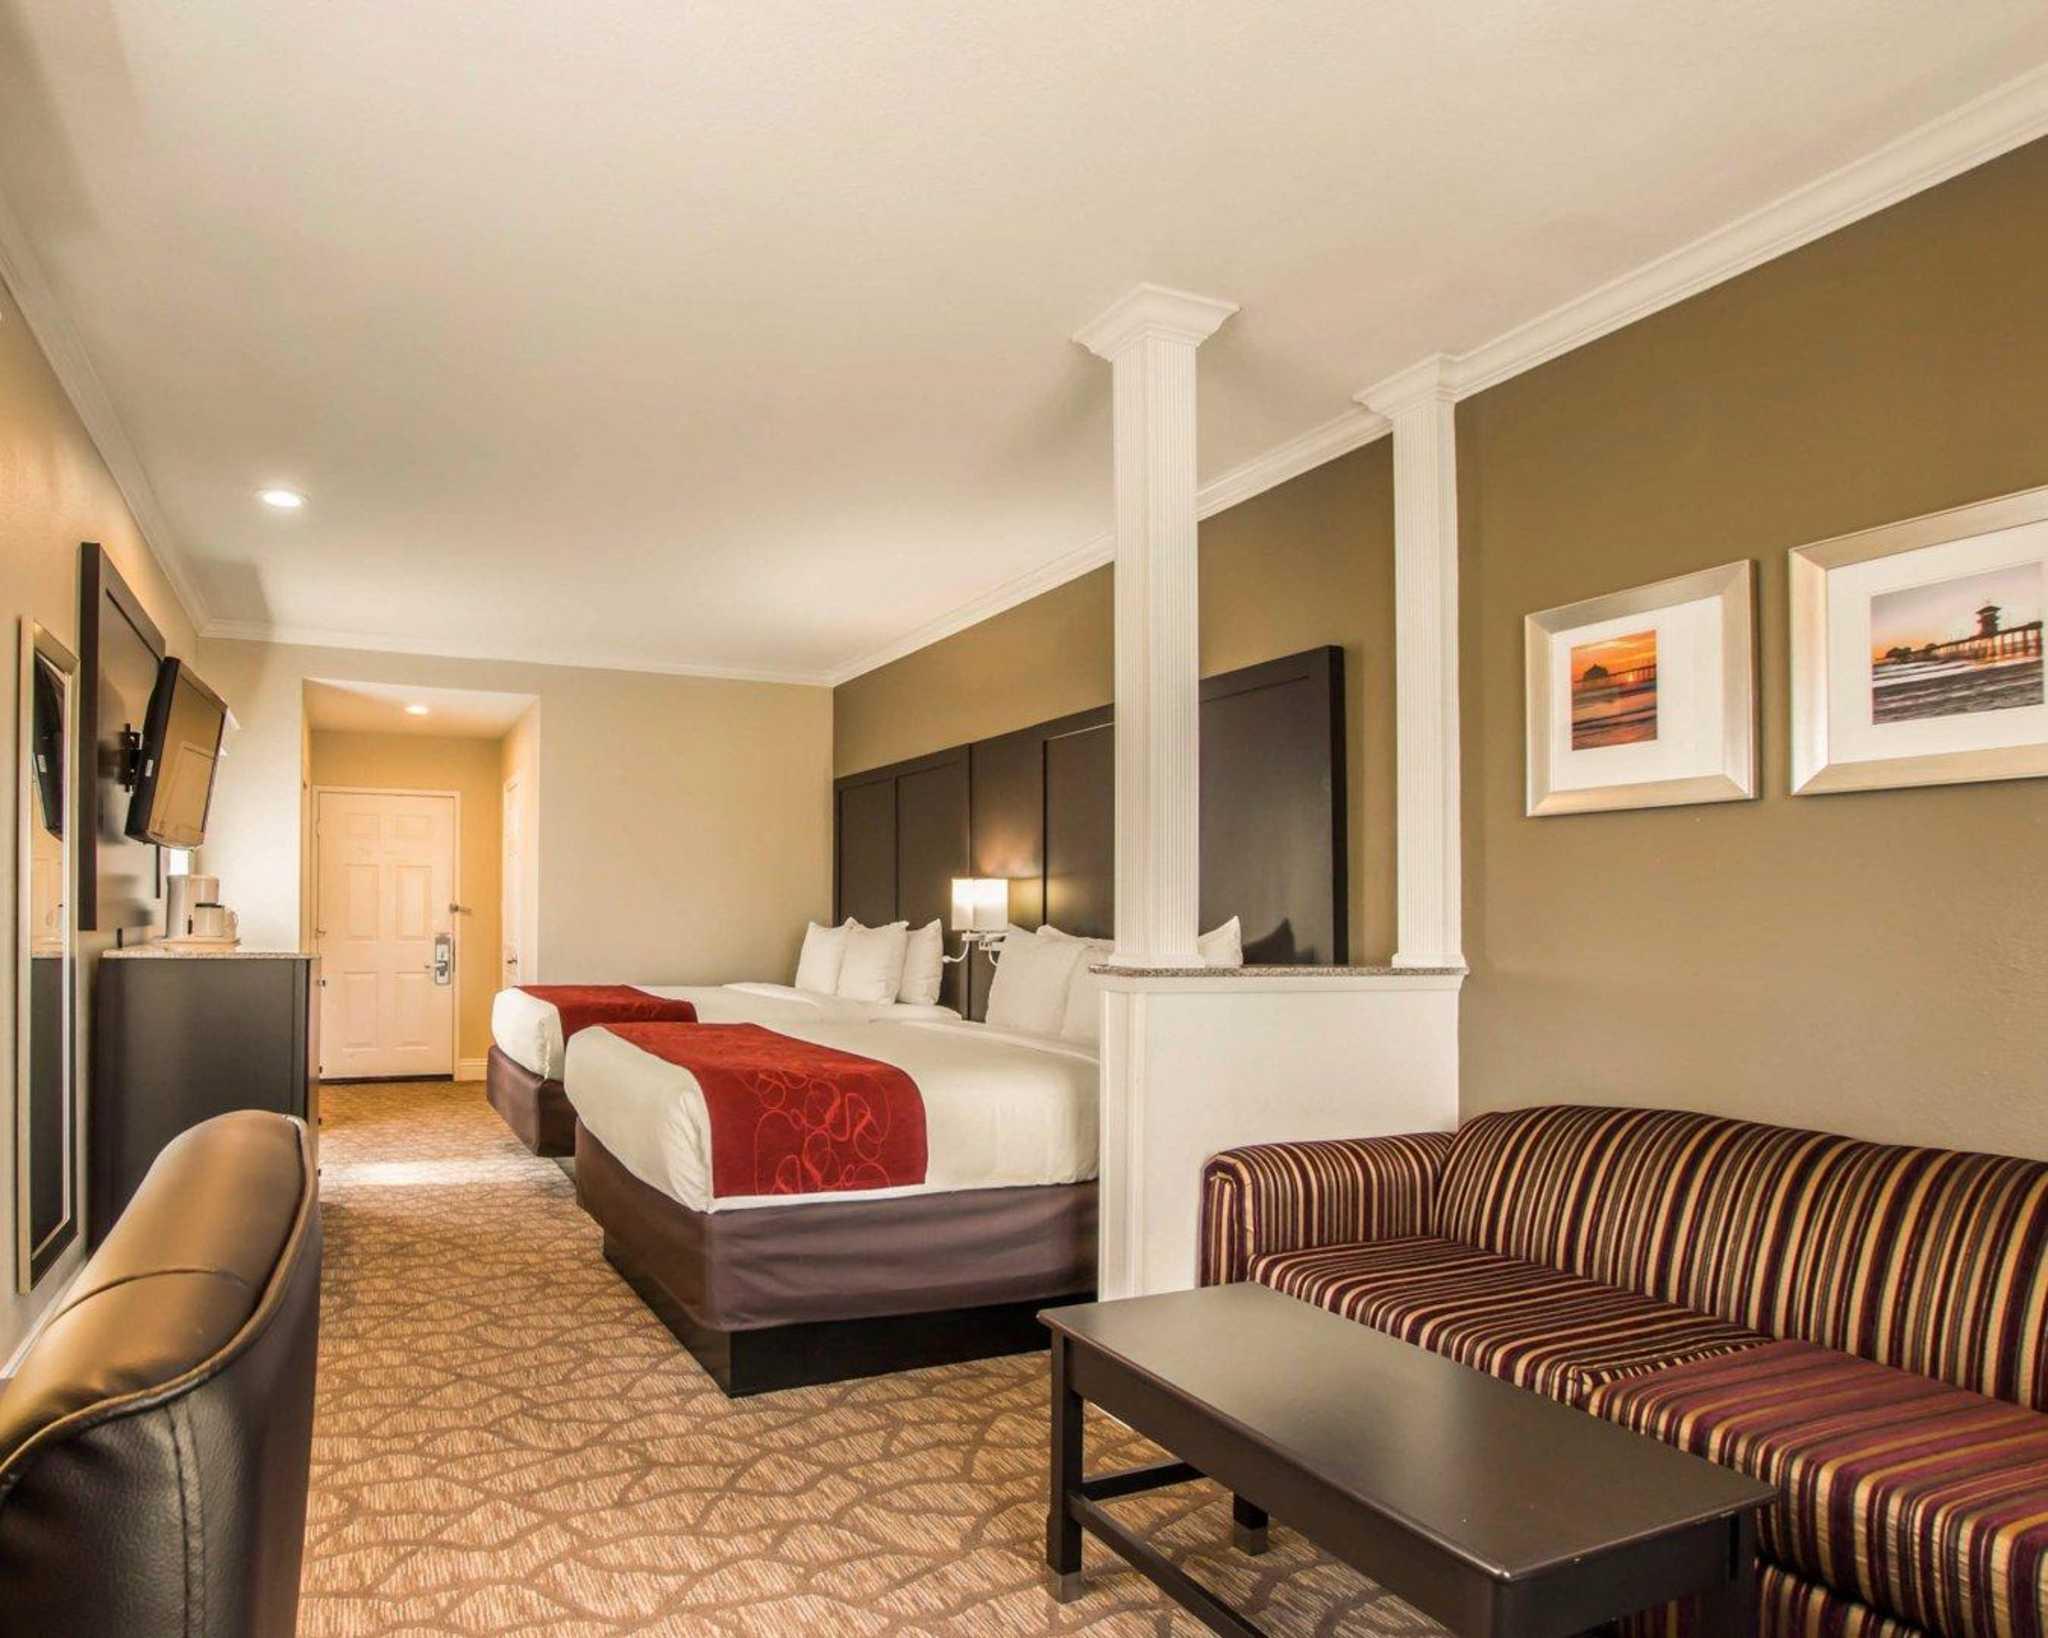 Comfort Suites Huntington Beach image 7